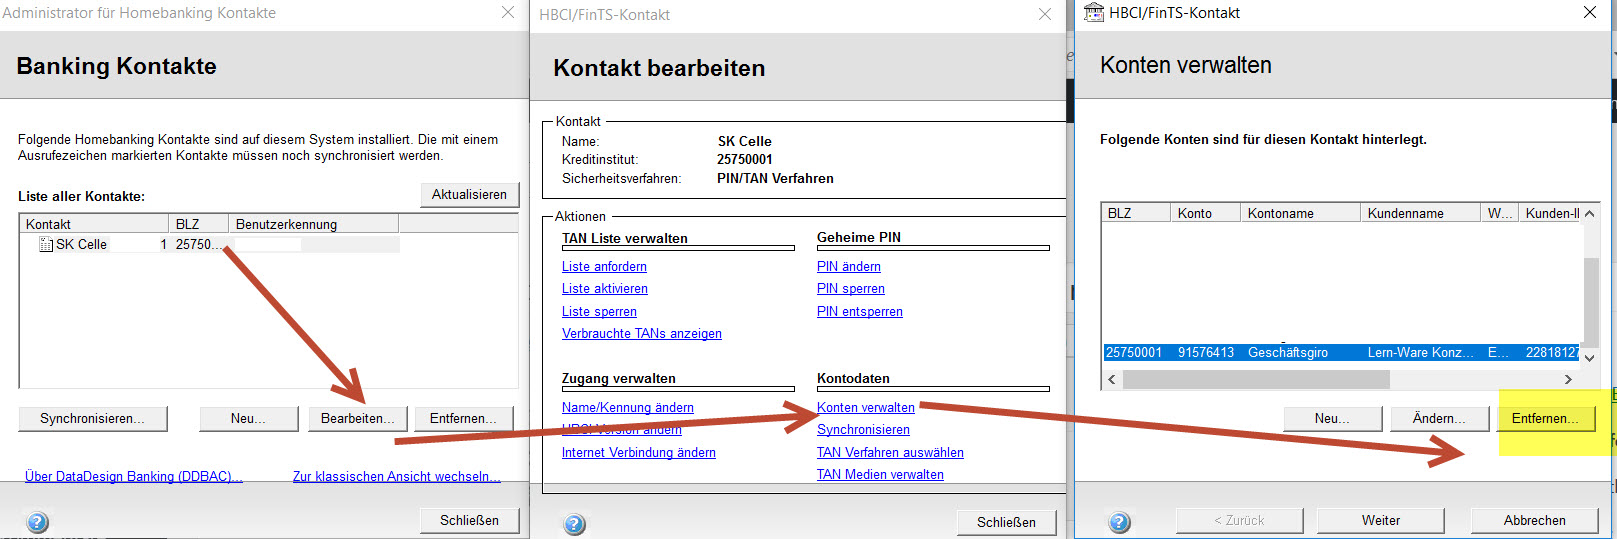 Dkb online banking gesperrt